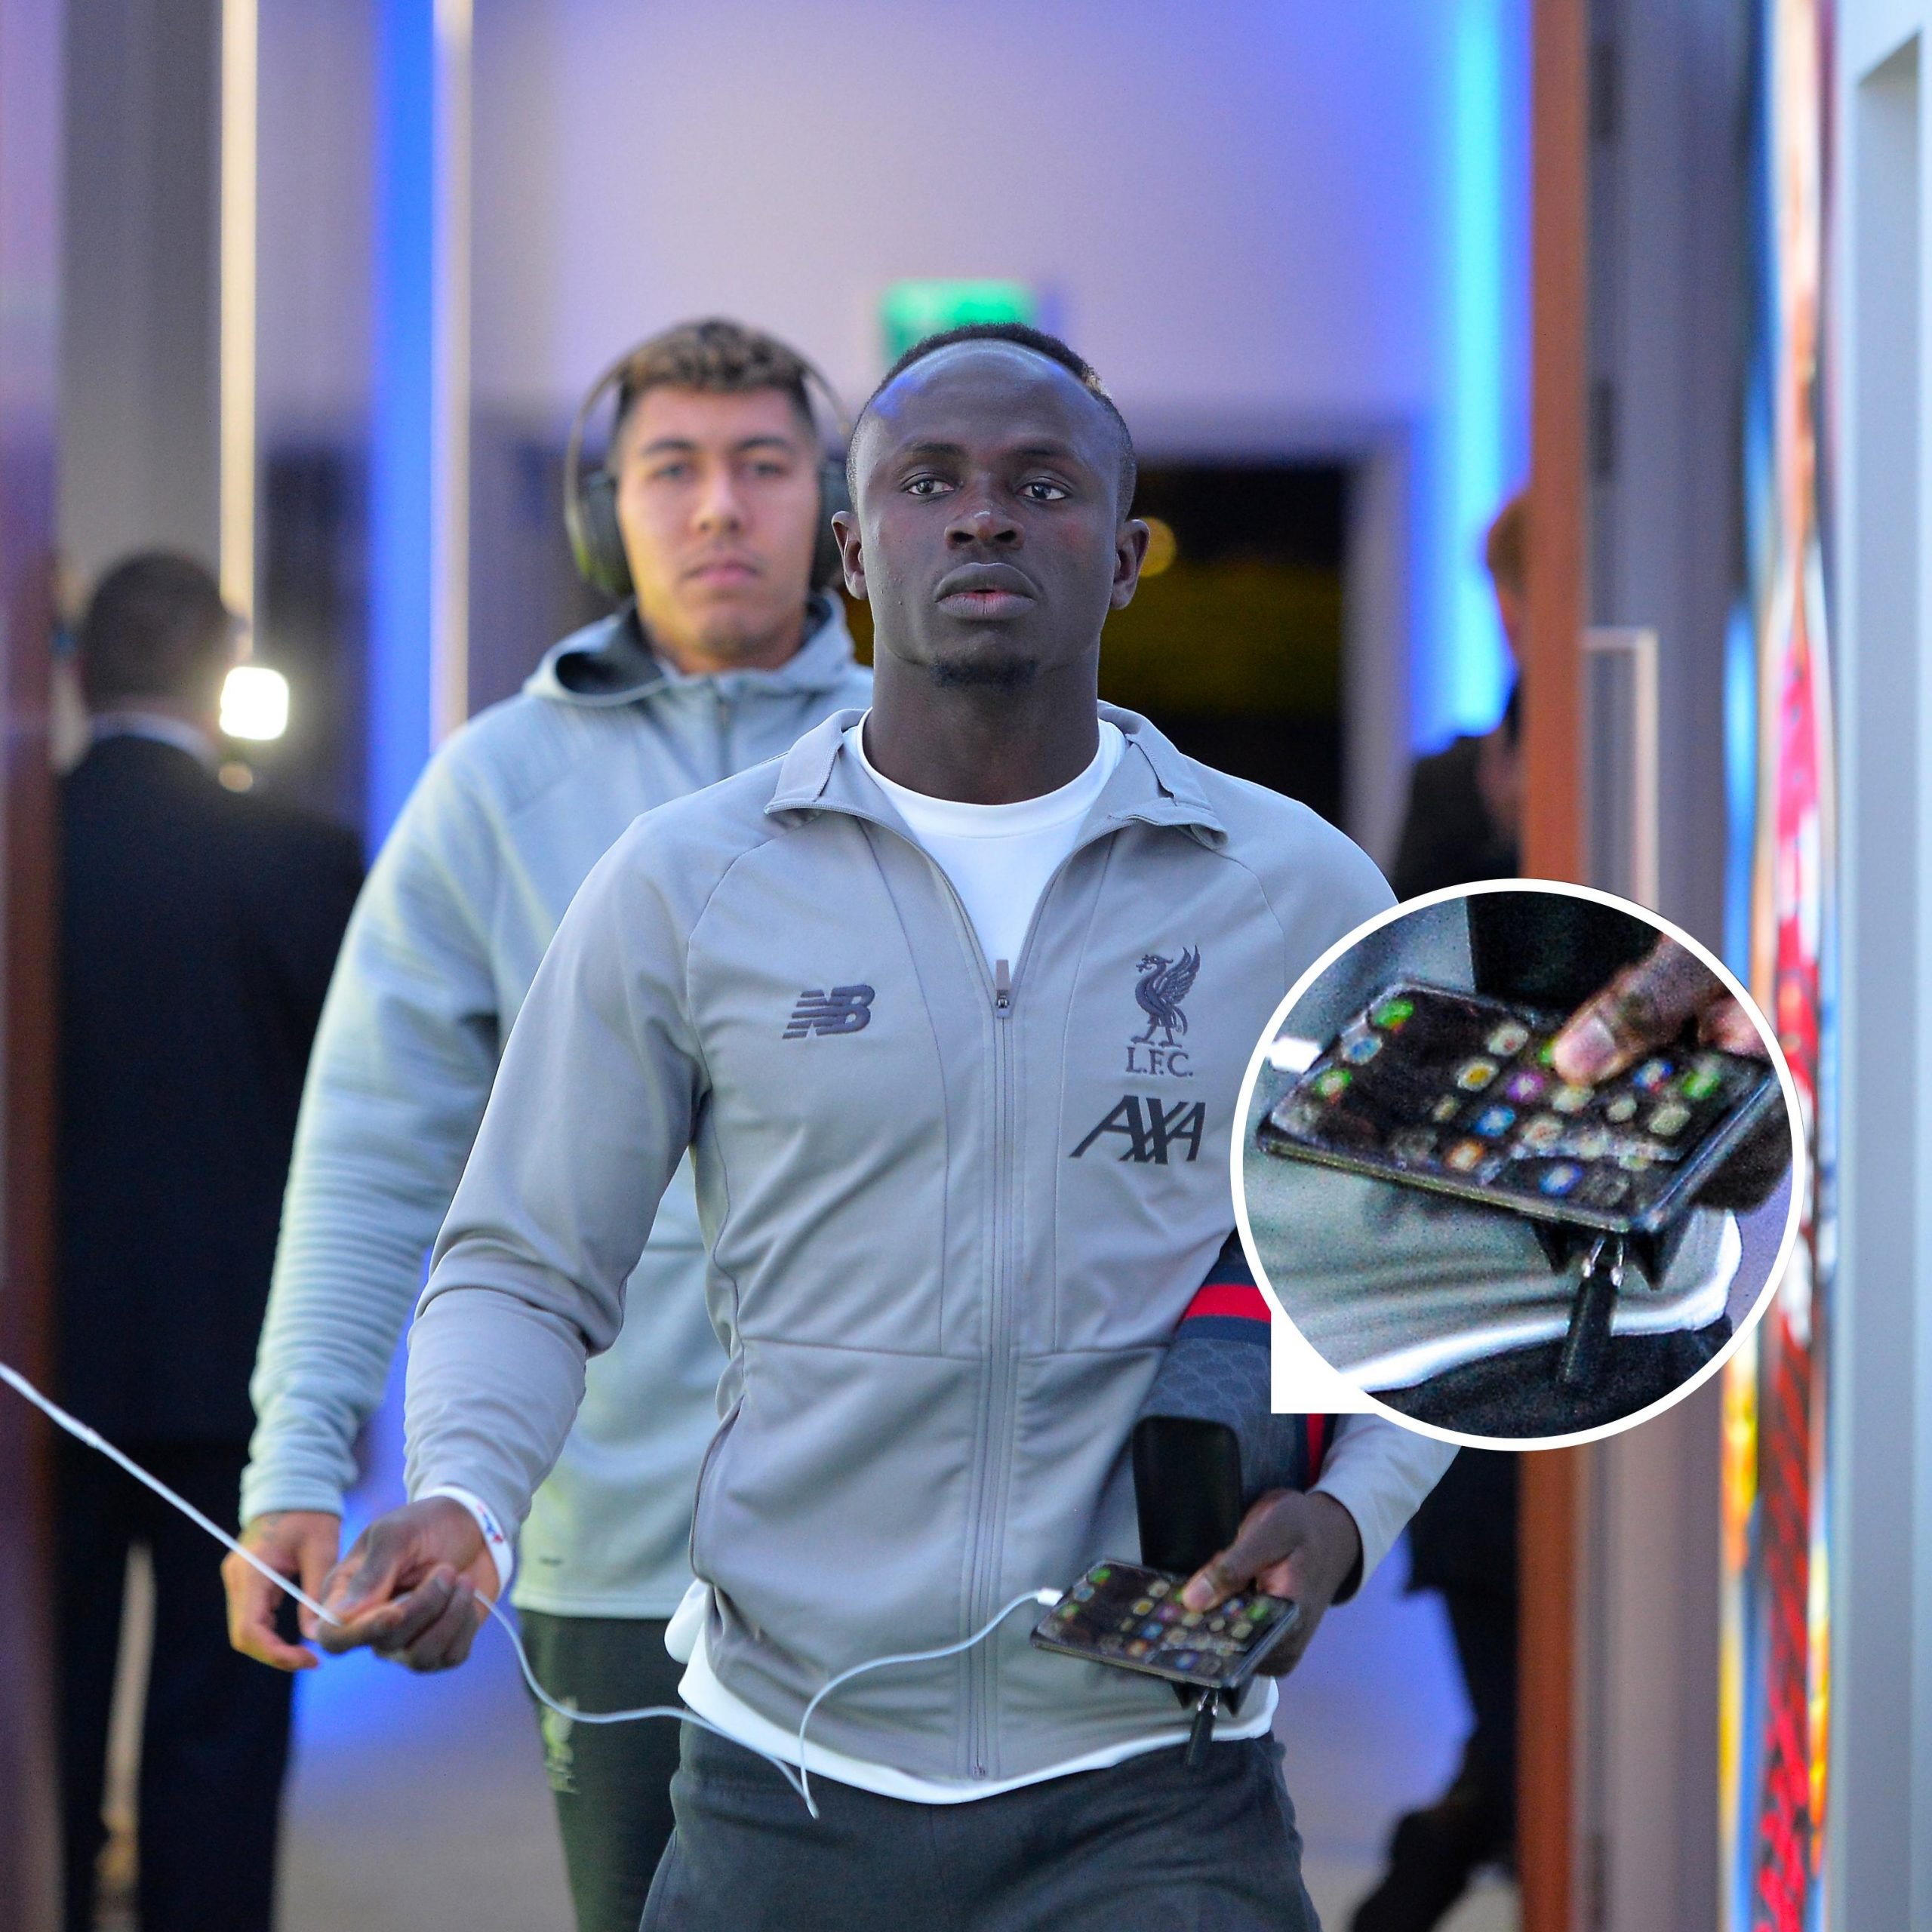 Sadio Mane's Phone With Cracked Screen Shocks Fans (Photos)